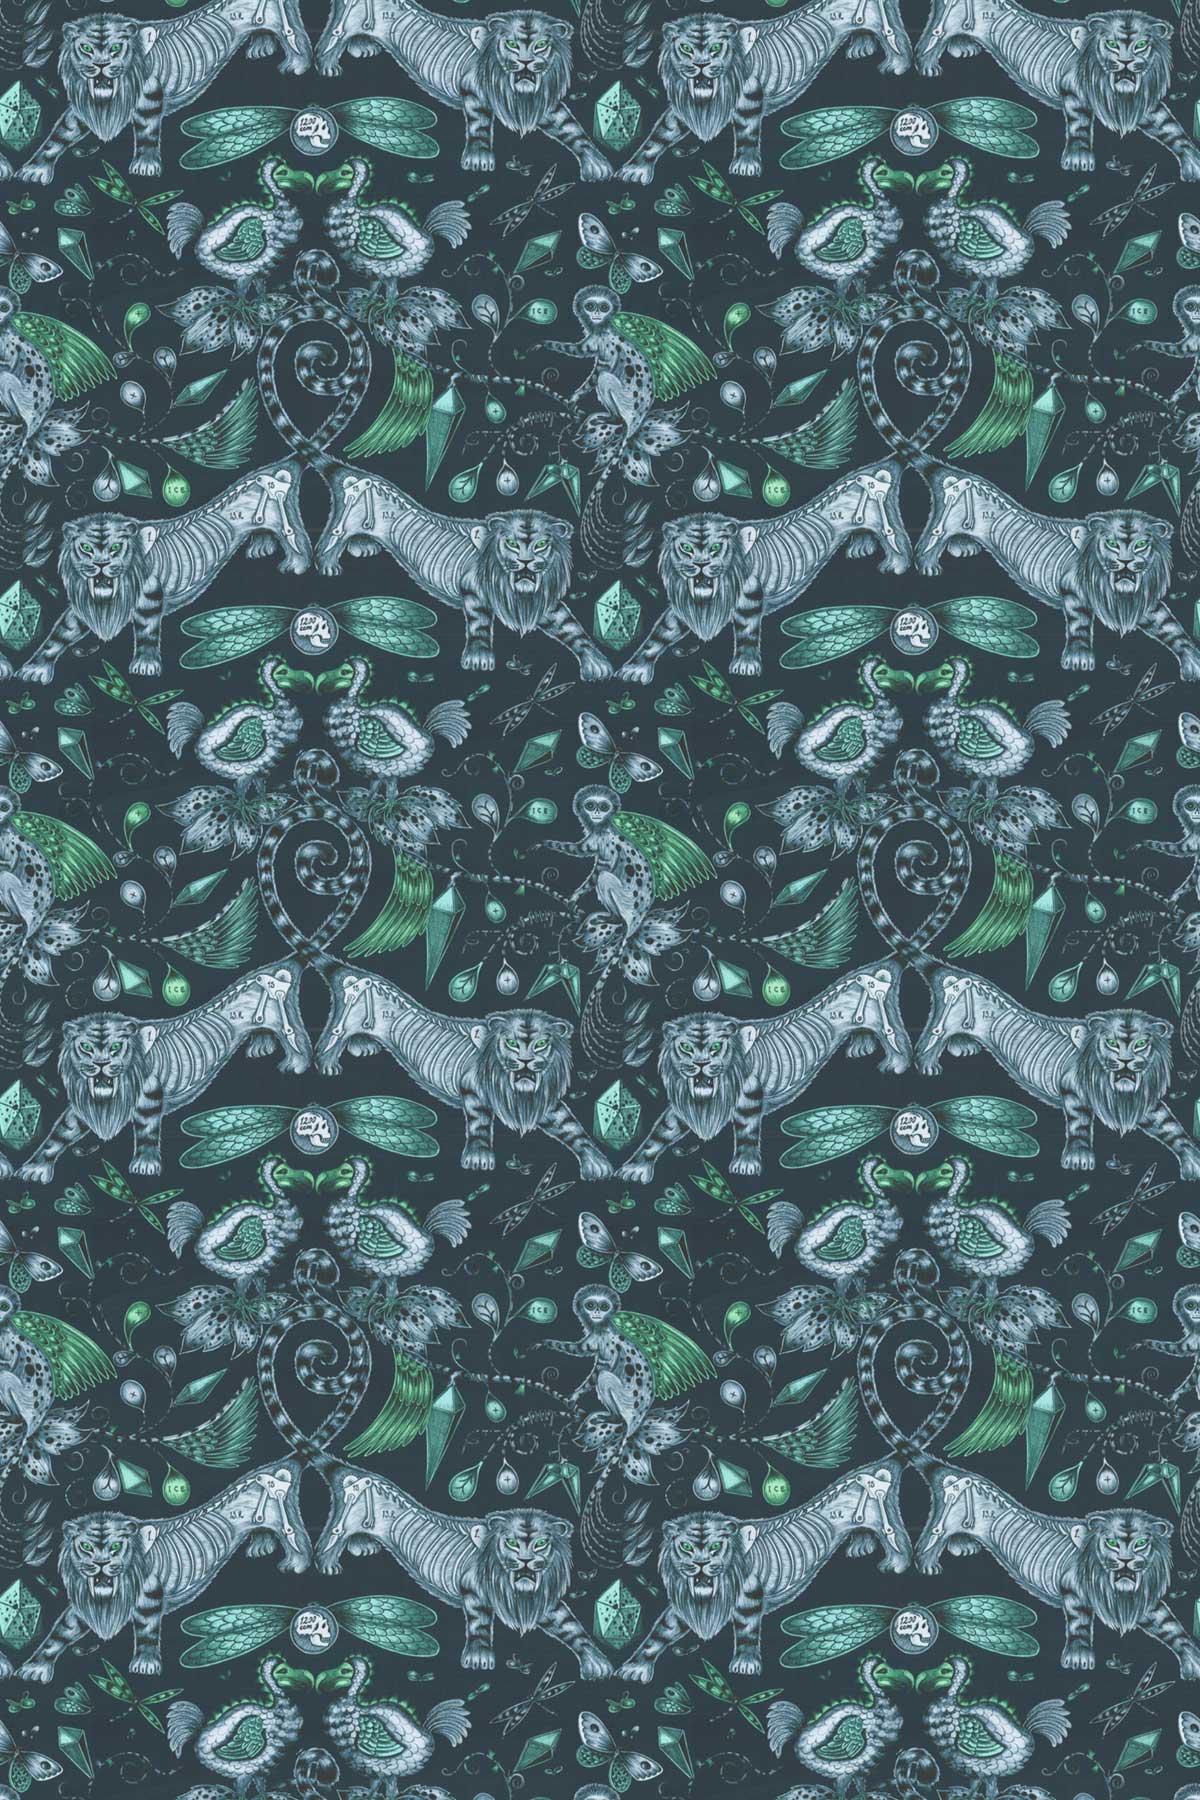 Emma J Shipley Extinct Velvet Navy Fabric - Product code: F1208/01